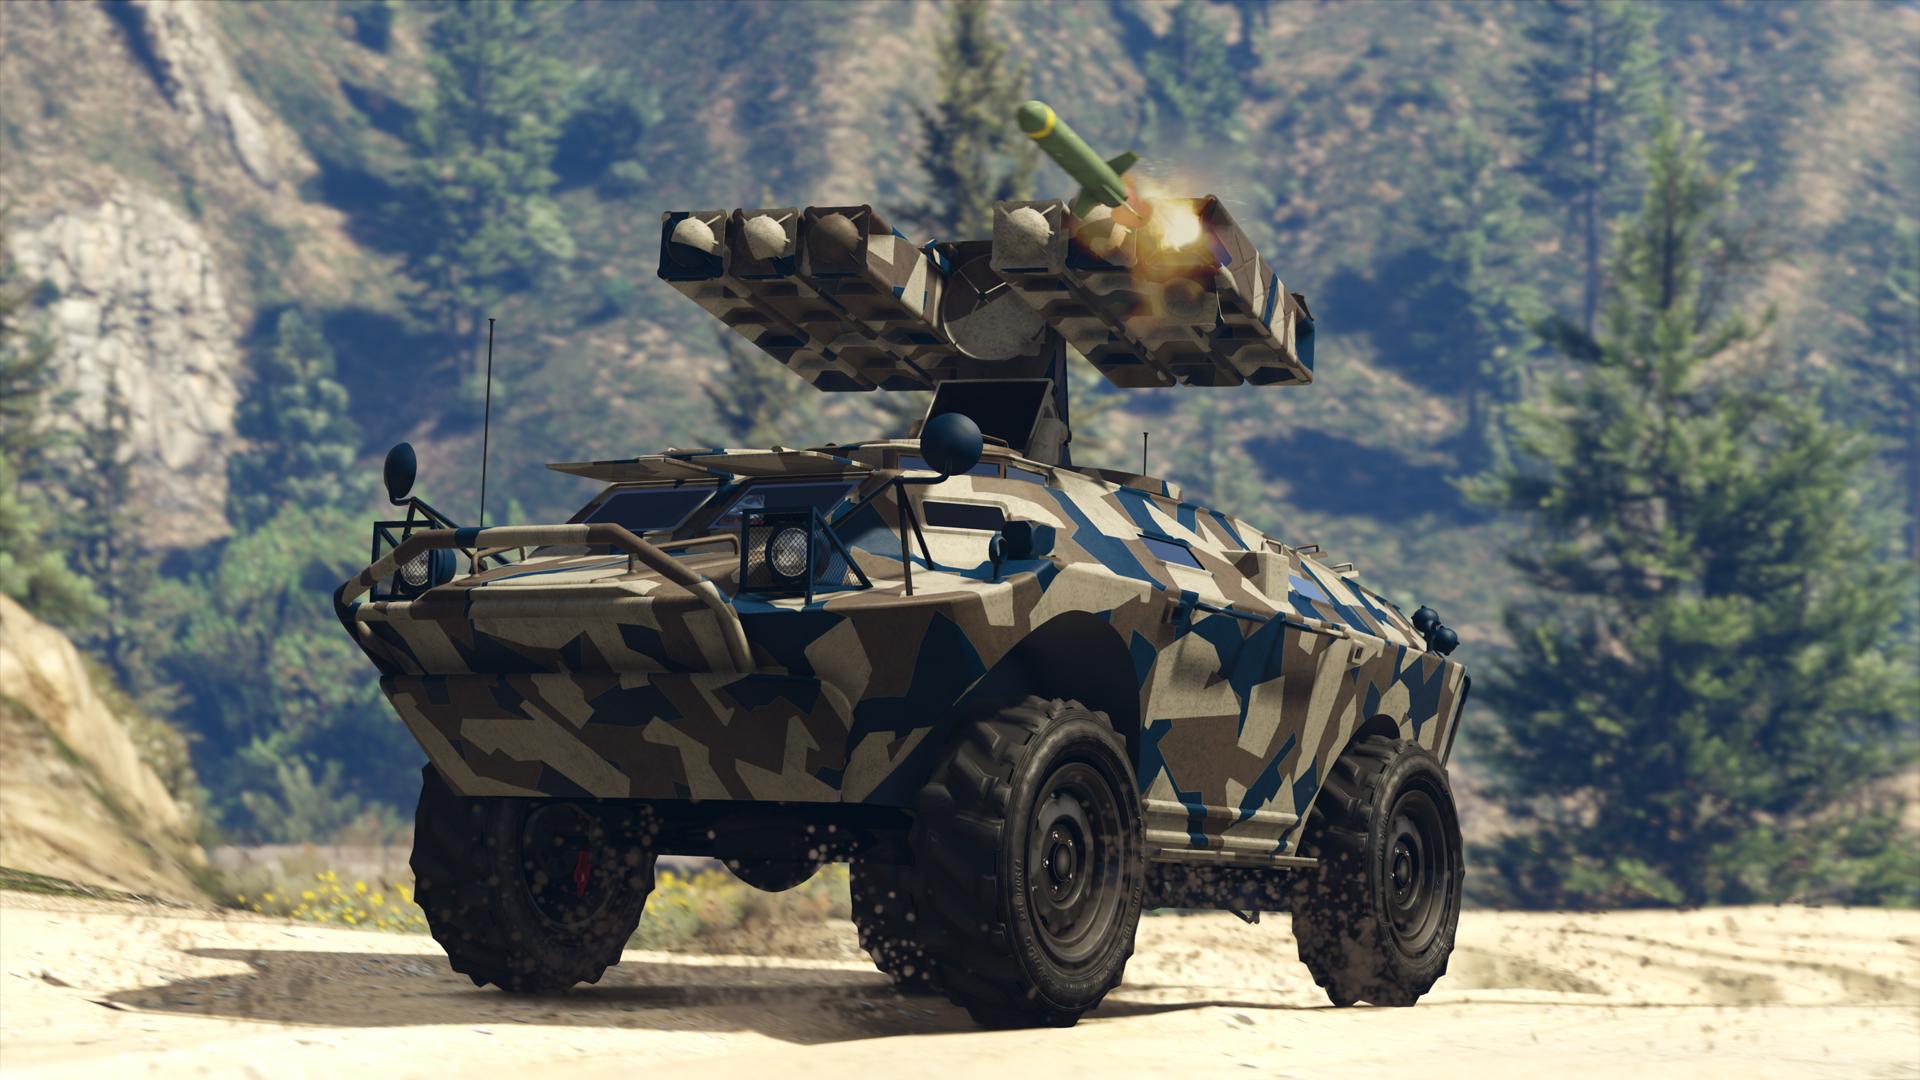 gta online�s gunrunning update introduces arms trafficking